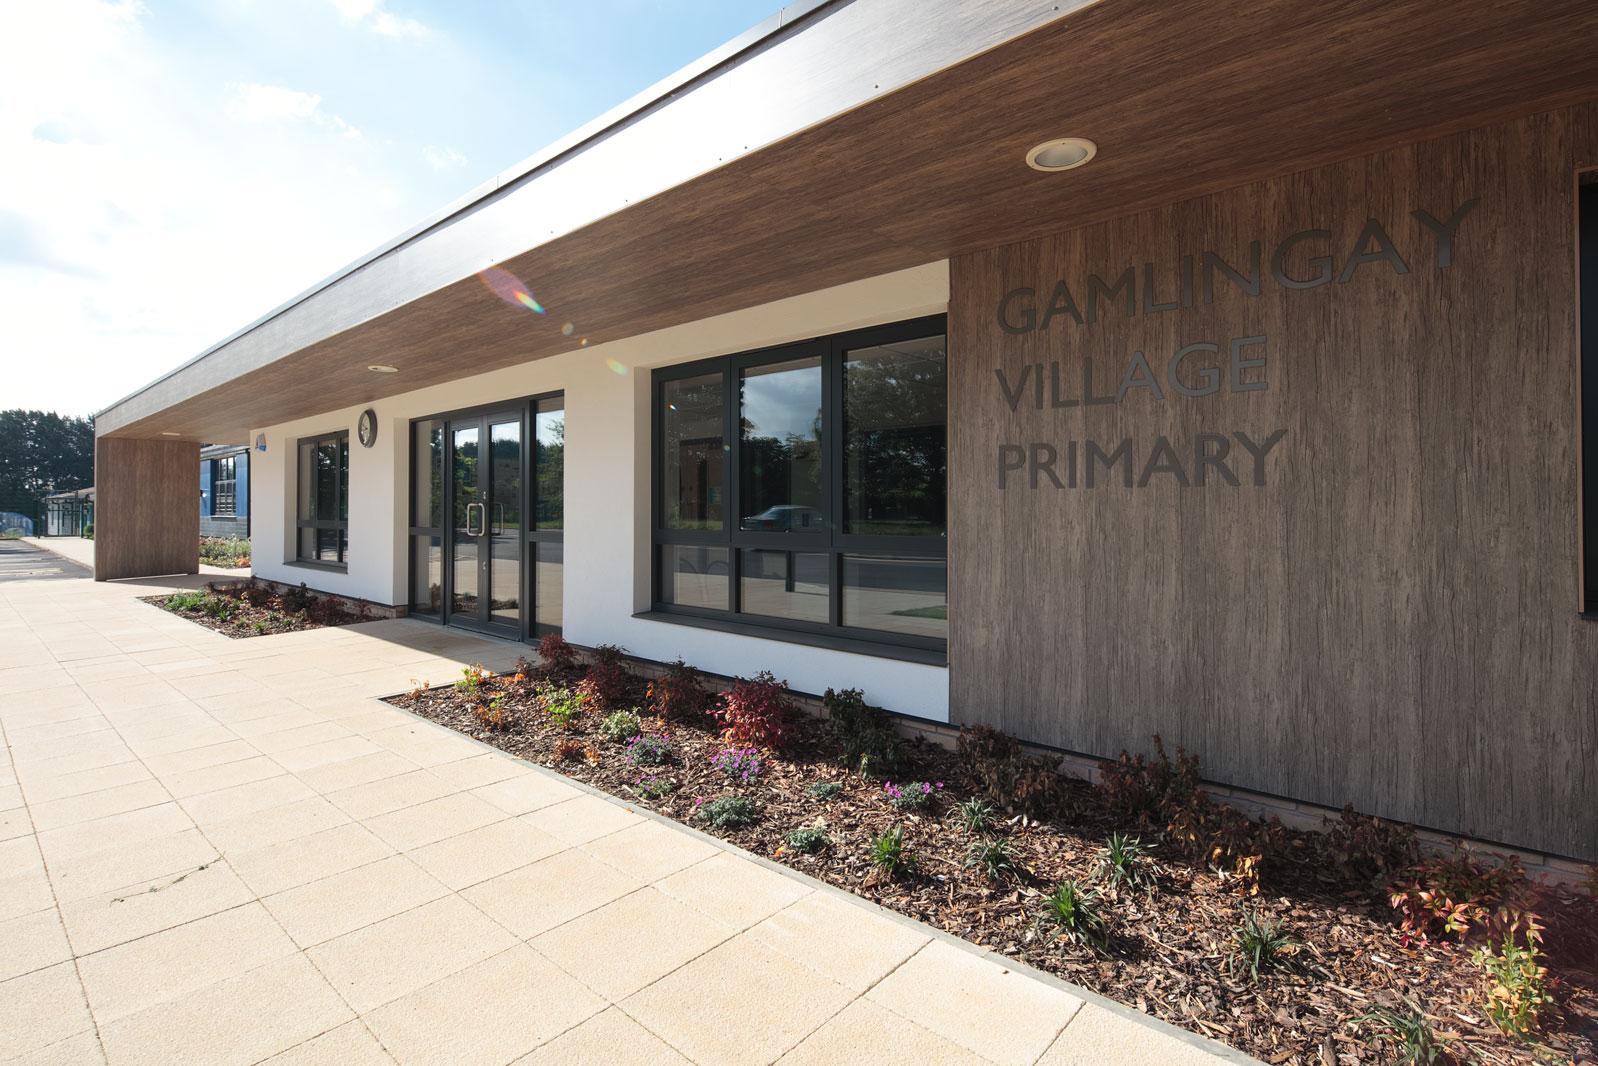 Gamlingay Village Primary